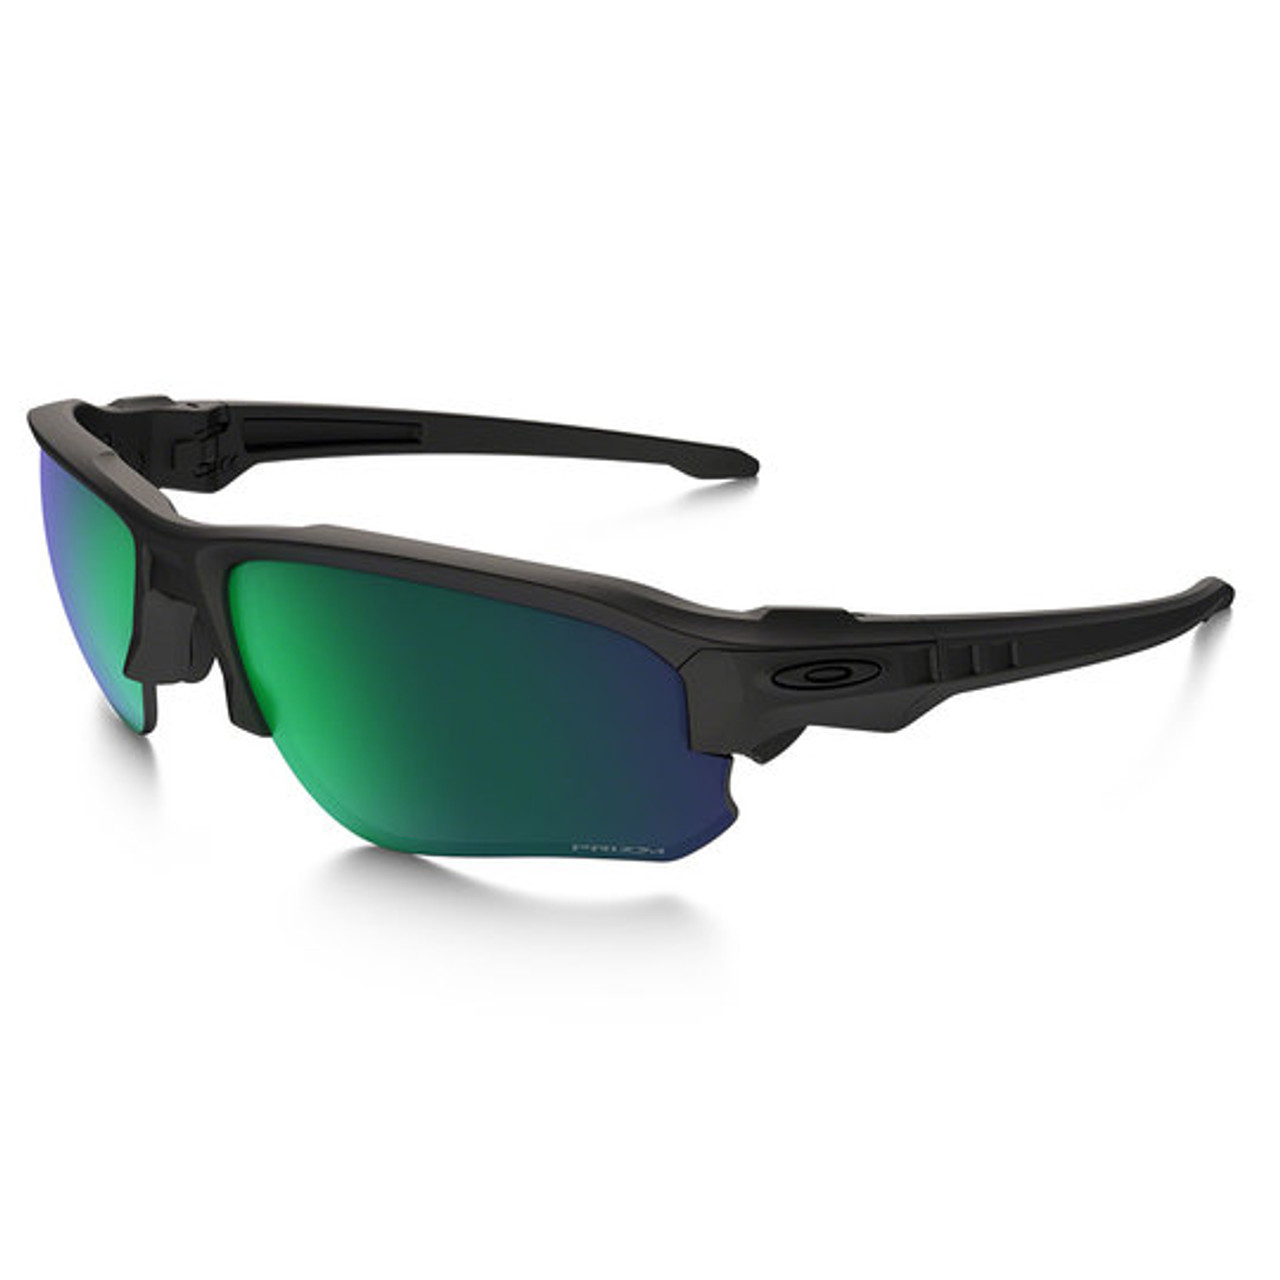 976ce0cc73 Oakley - Eyewear - SI Speed Jacket (Matte Black Frame w  Prizm Maritime  Polarized Lens) - Amped Airsoft